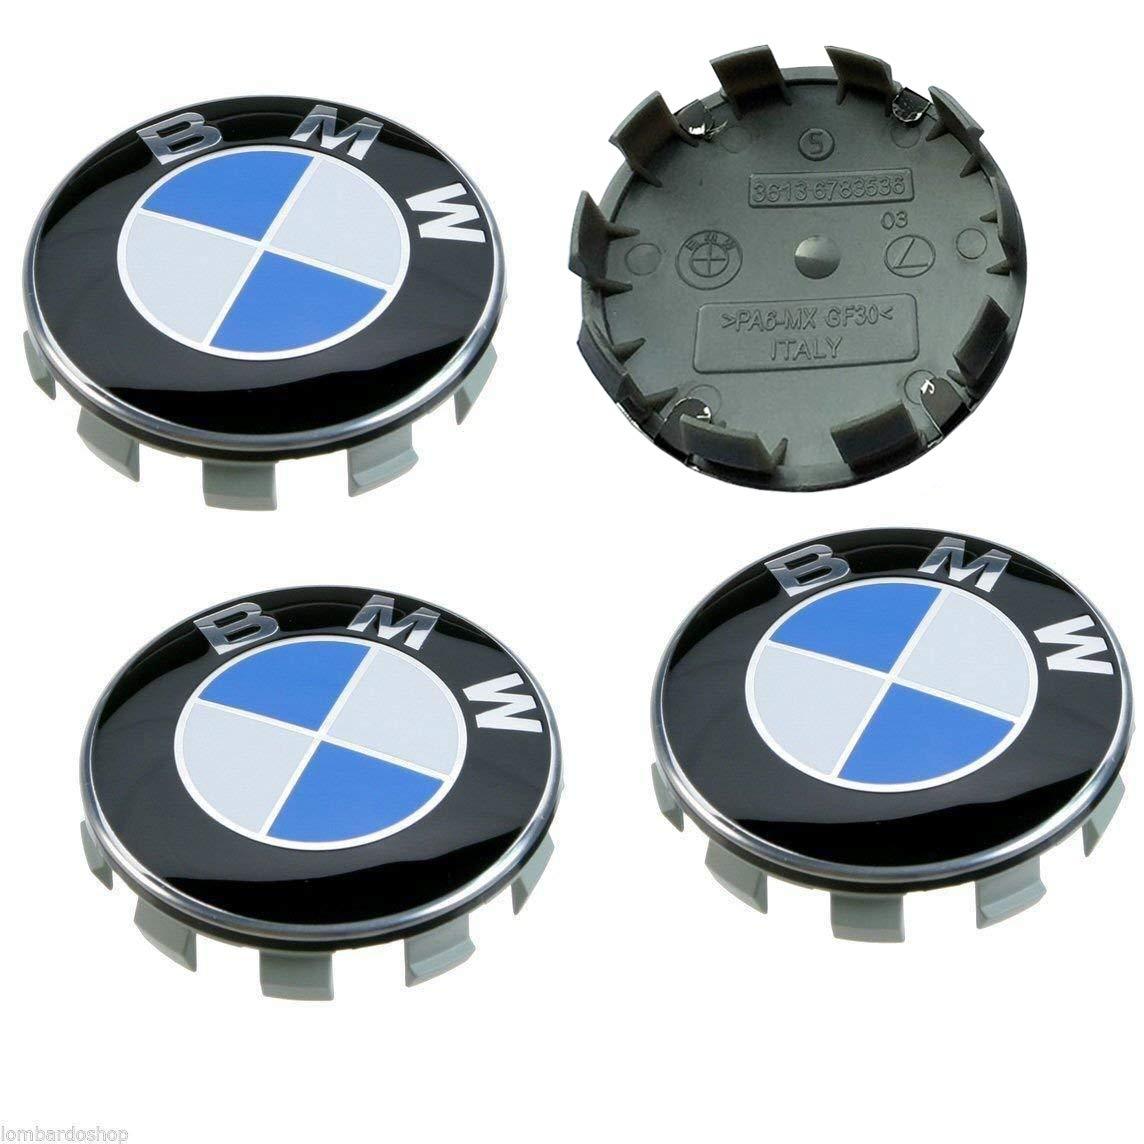 4 X Coprimozzi Tappi BMW 68mm Mozzo Cerchi Copricerchi Series 1 3 4 5 6 7 8 x1 X3 X4 X5 X6 Z3 Z4 36136783536 36131095361 36136768640 E36 E38 E39 E46 E53 E60 E61 E63 E64 E65 E66 E70 E71 E82 E83 E84 E85 E86 E88 E89 E90 E91 TTR